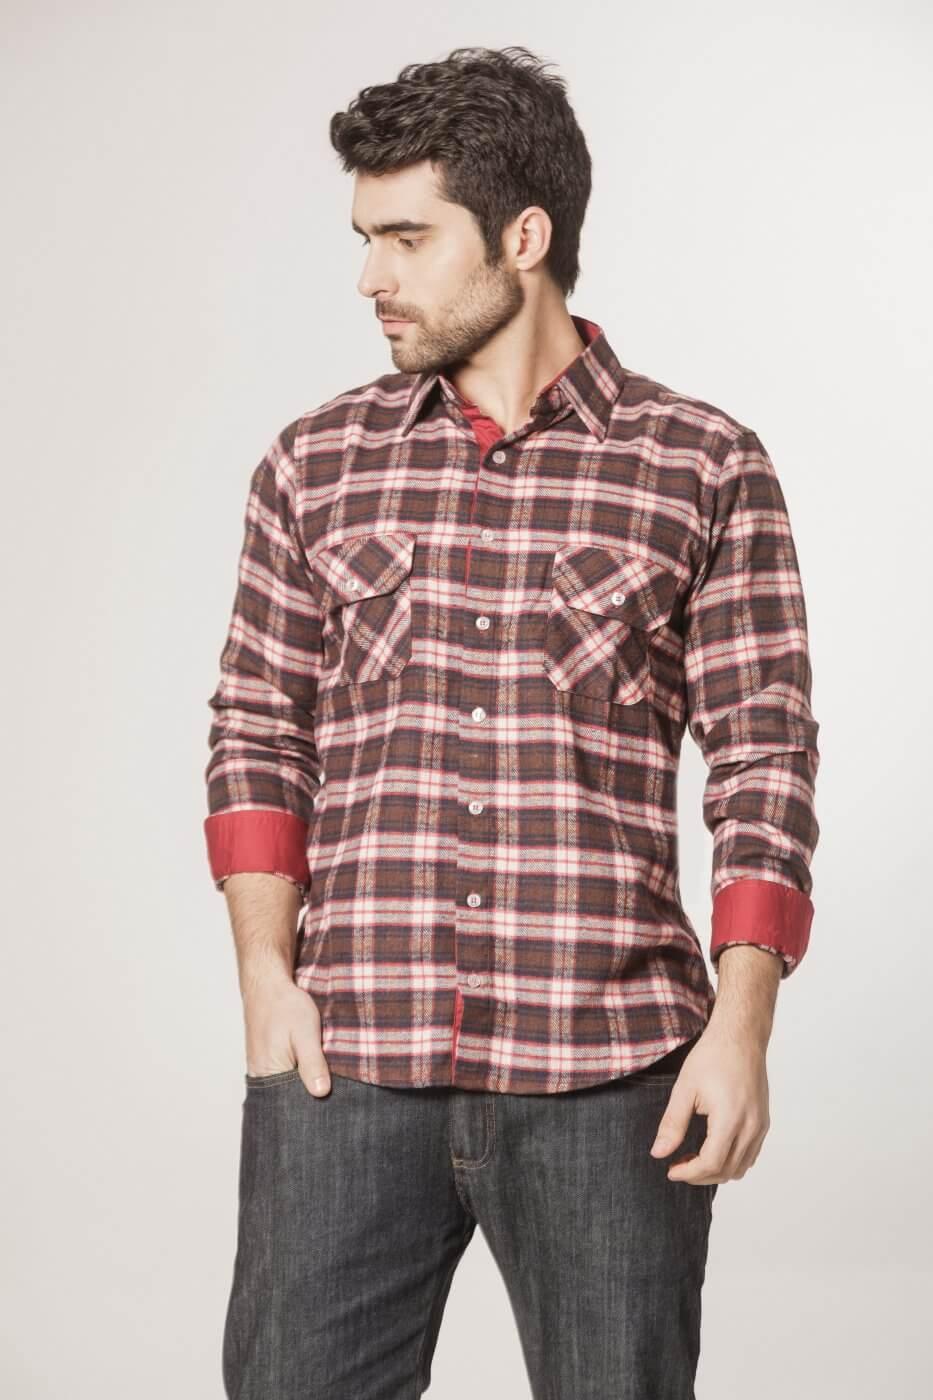 Camisa Tradicional Flanela Xadrez Vermelho e Marrom